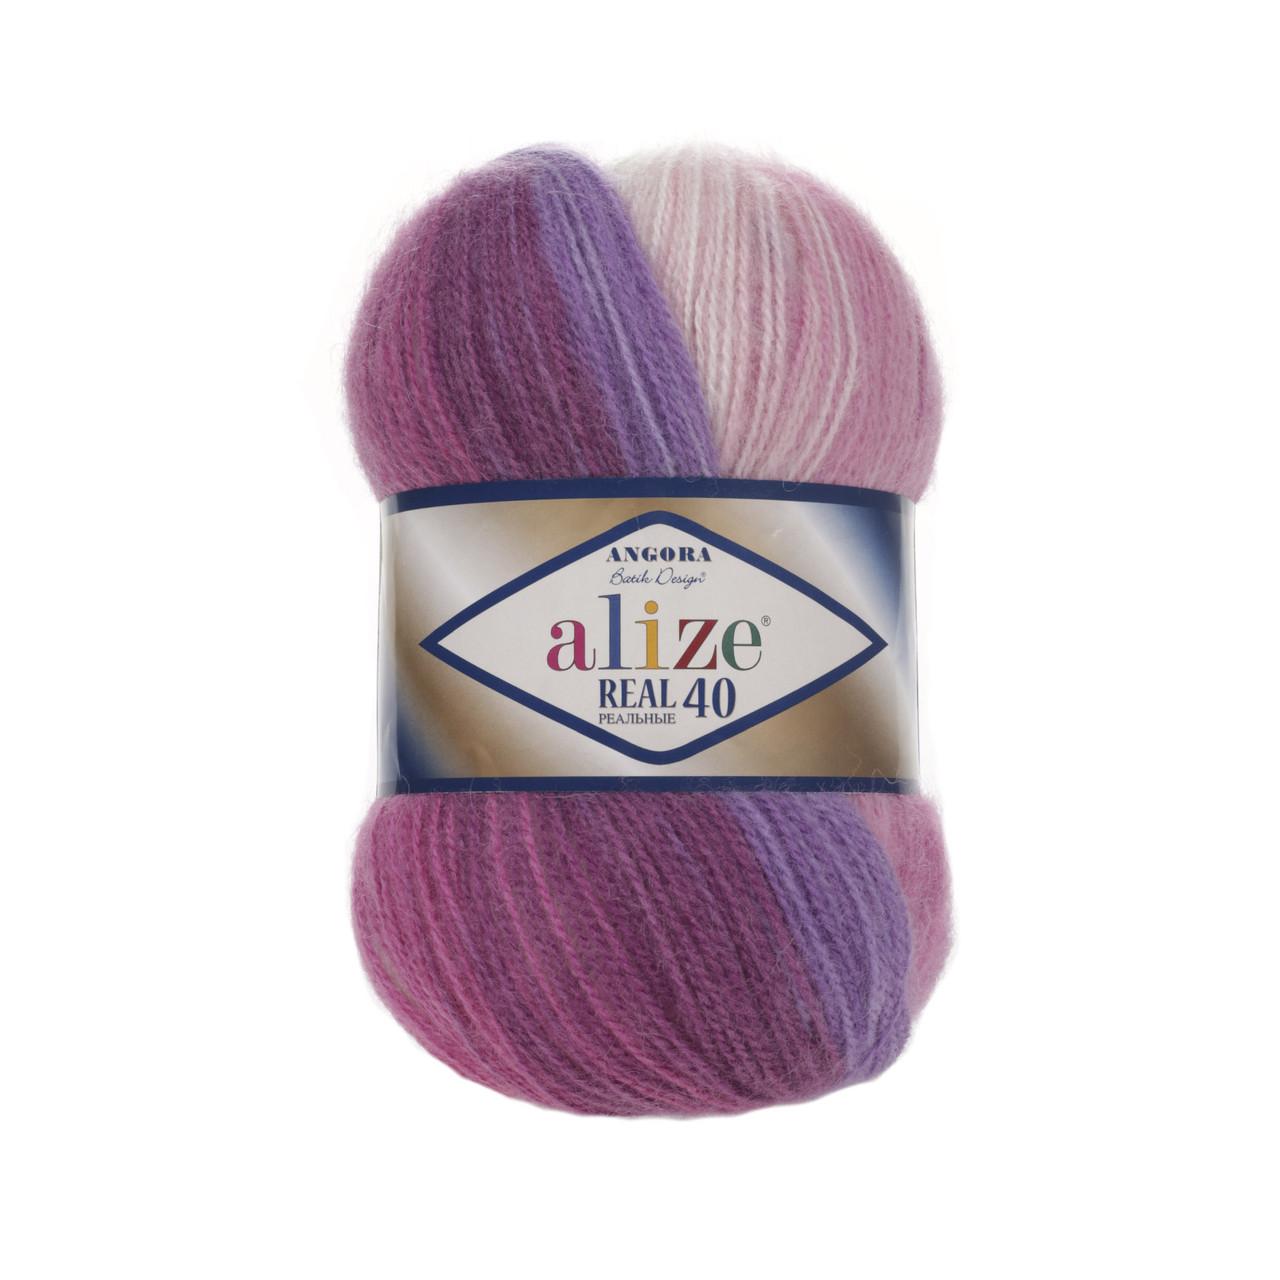 Alize Angora Real 40 Batik 3950 нитки для вязания цена 27560 грн